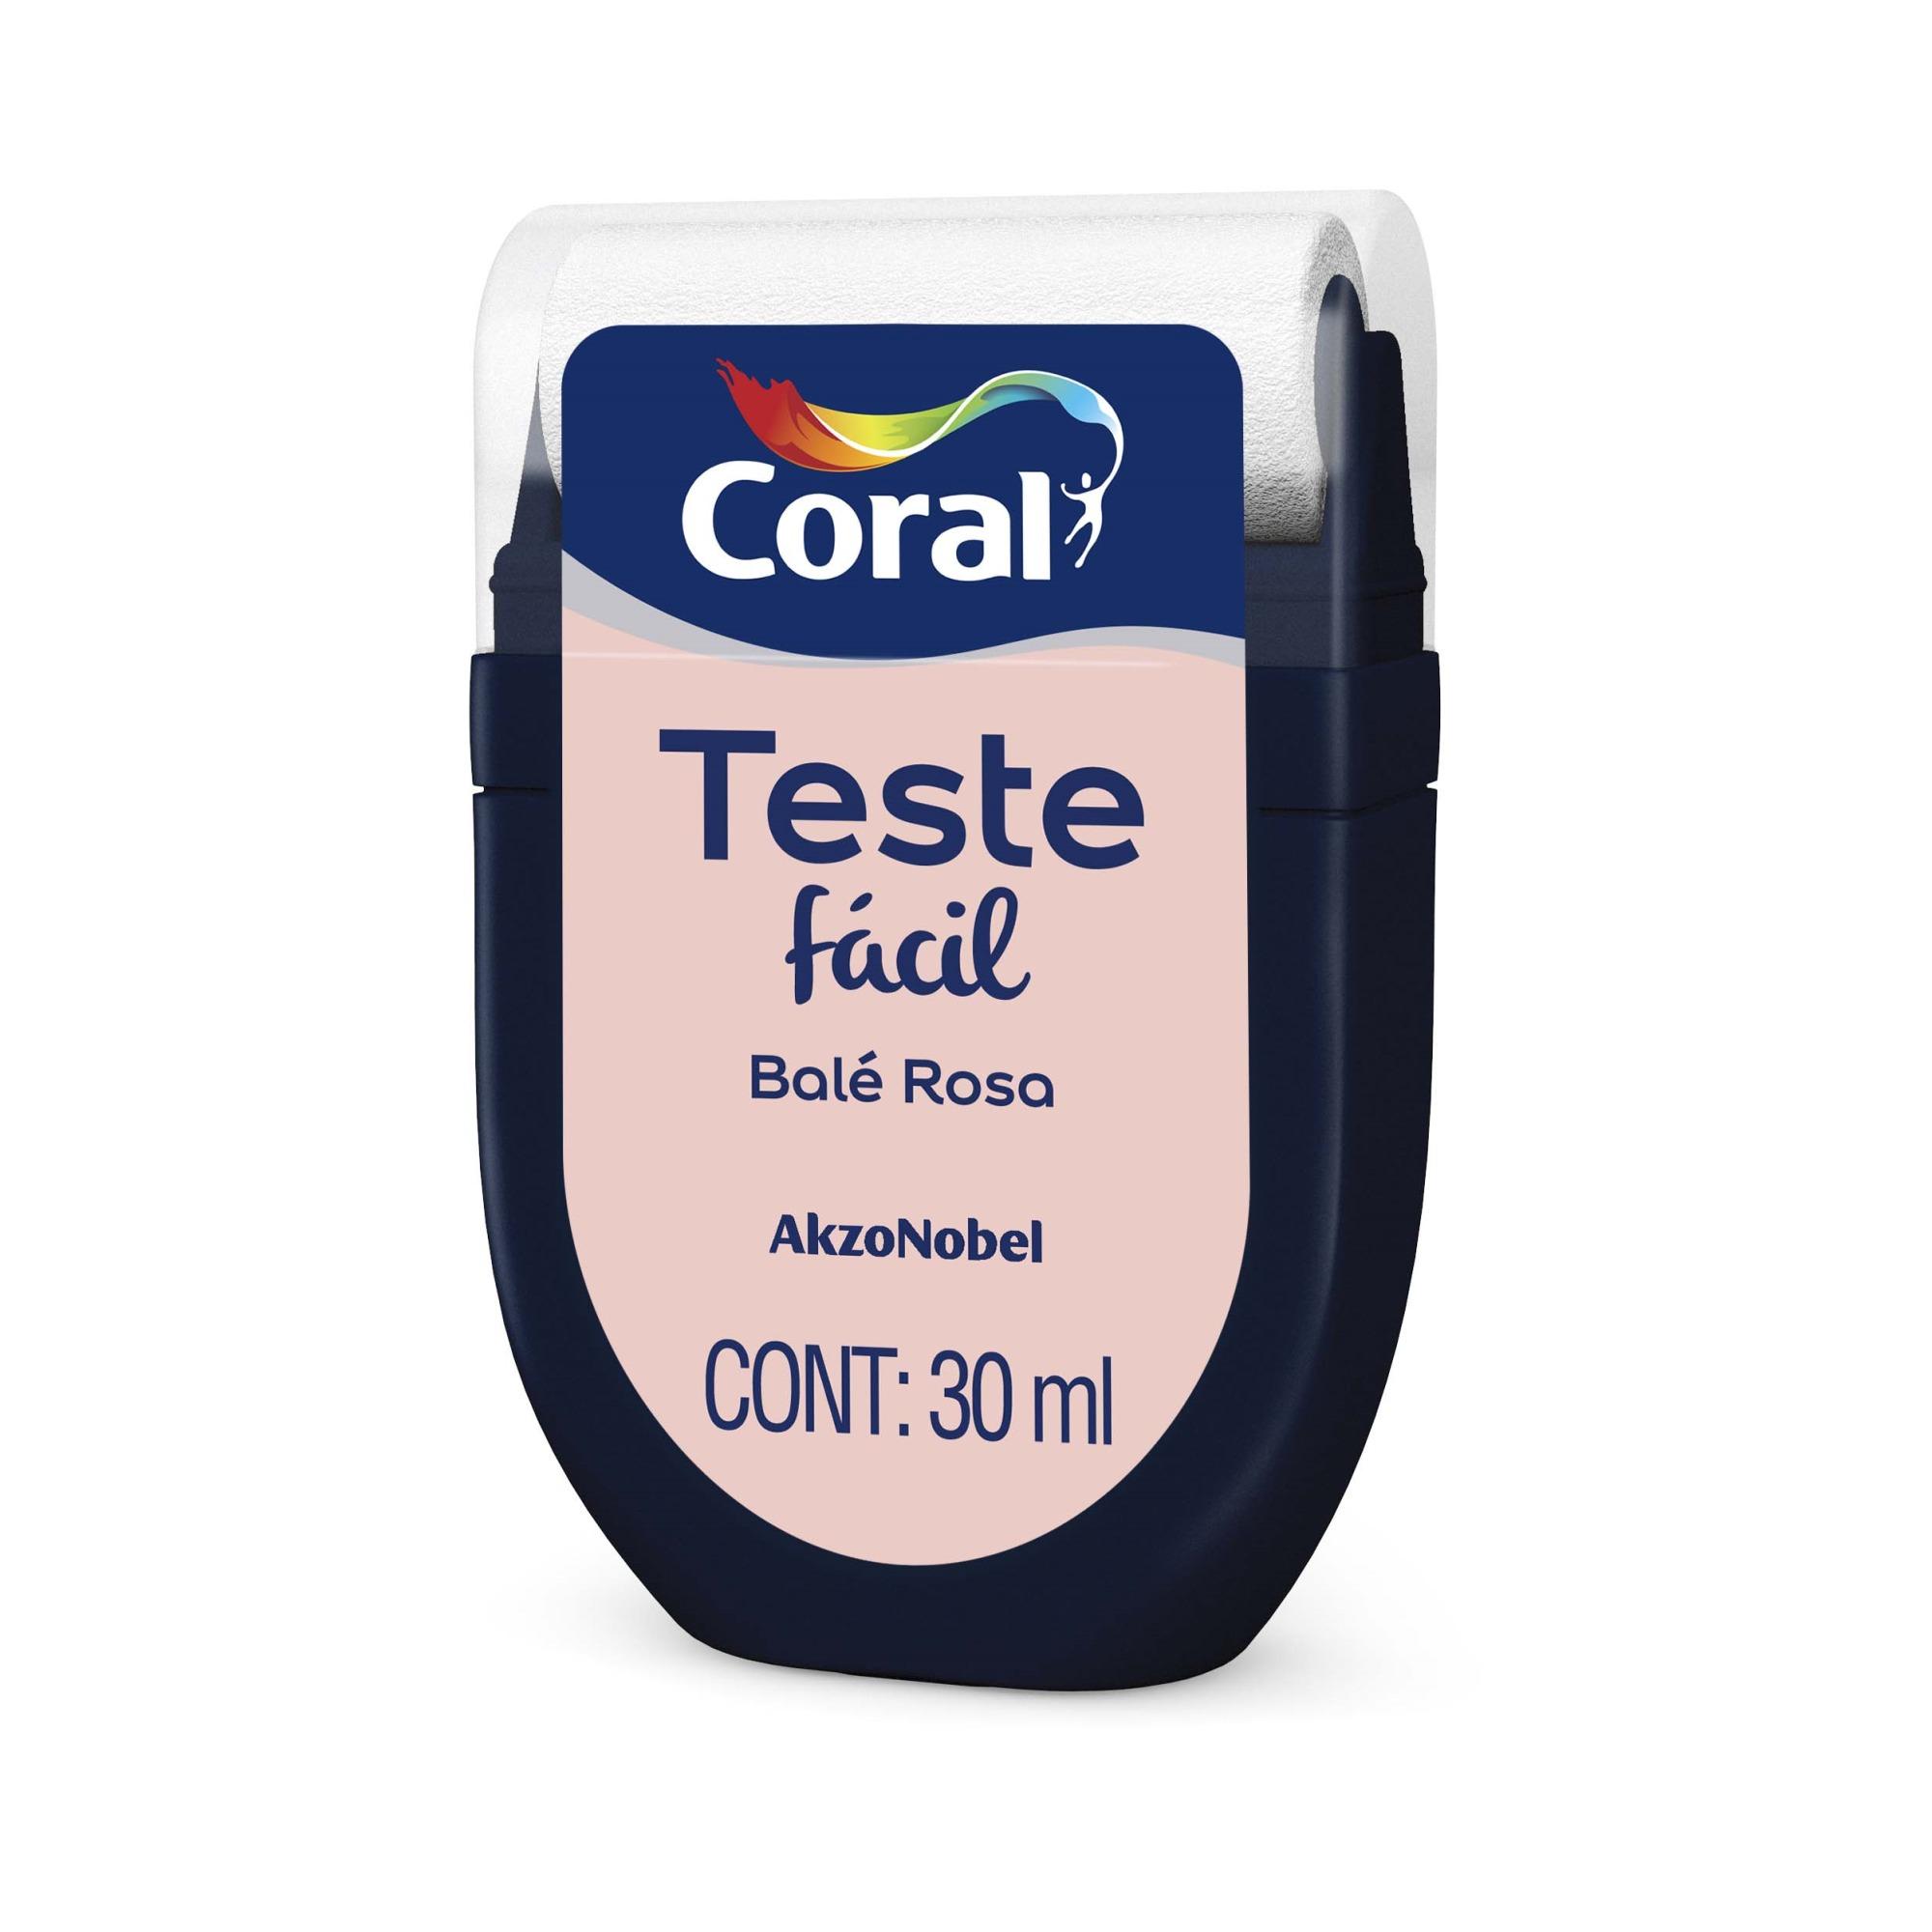 Teste Facil 30ml Bale Rosa - Coral